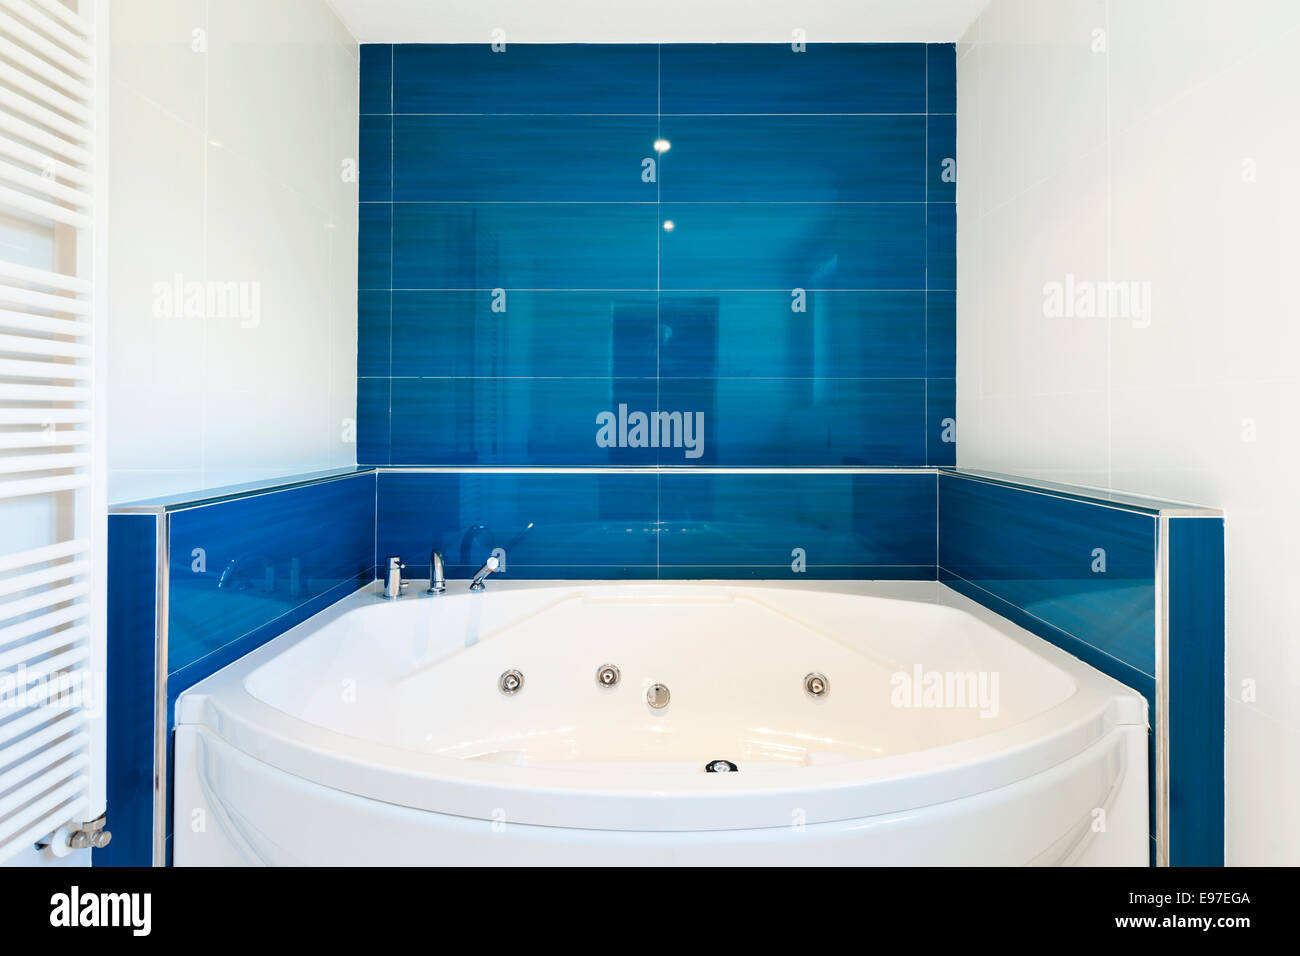 Empty Hot Tub Stock Photos & Empty Hot Tub Stock Images - Alamy